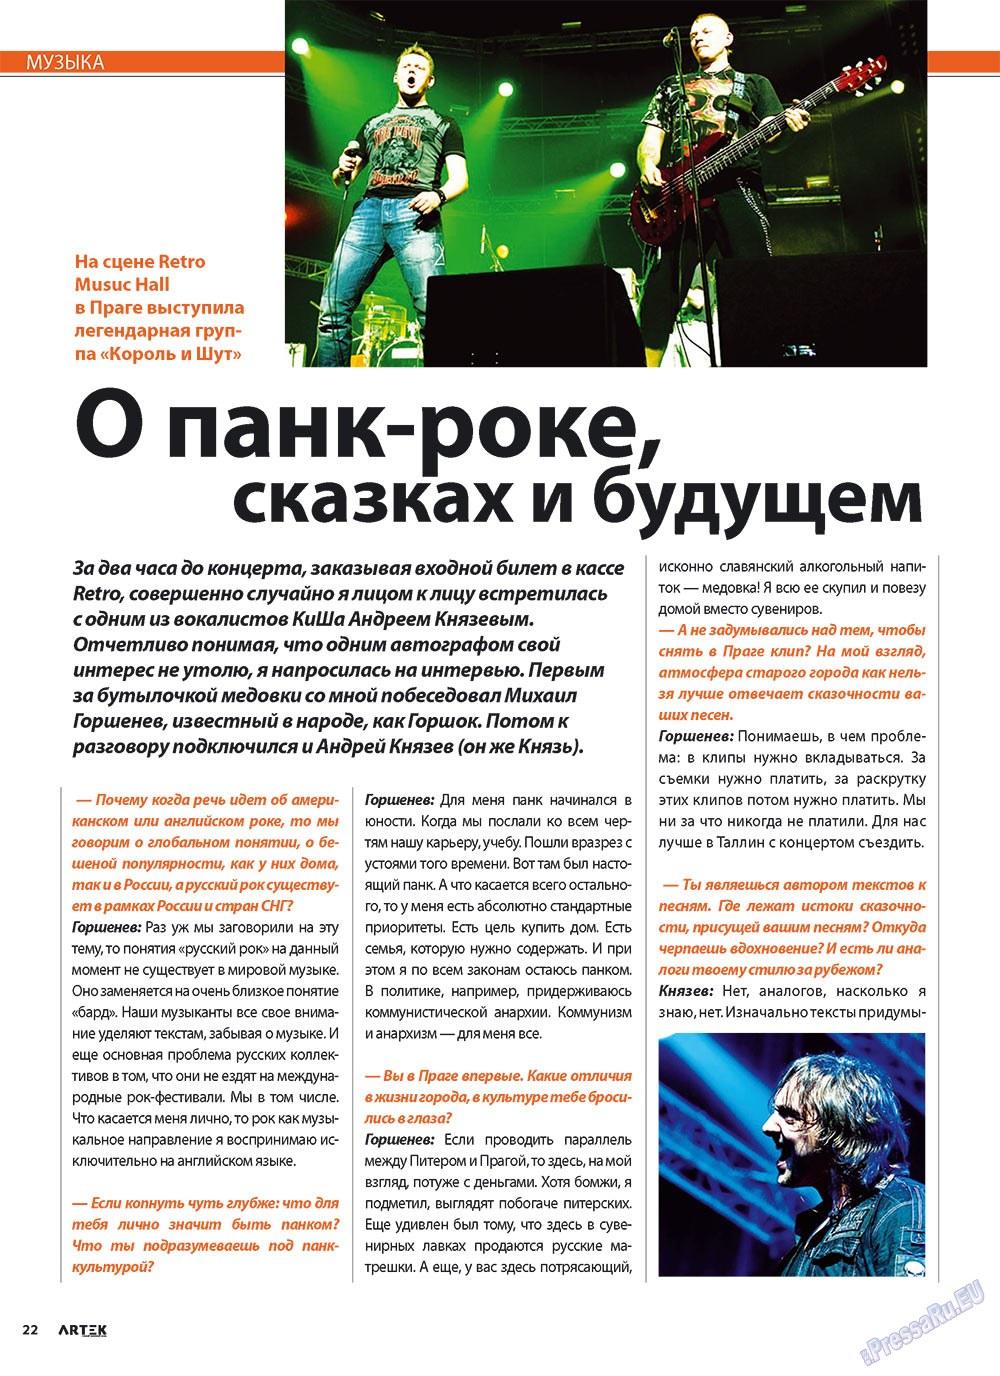 Артек (журнал). 2010 год, номер 2, стр. 24